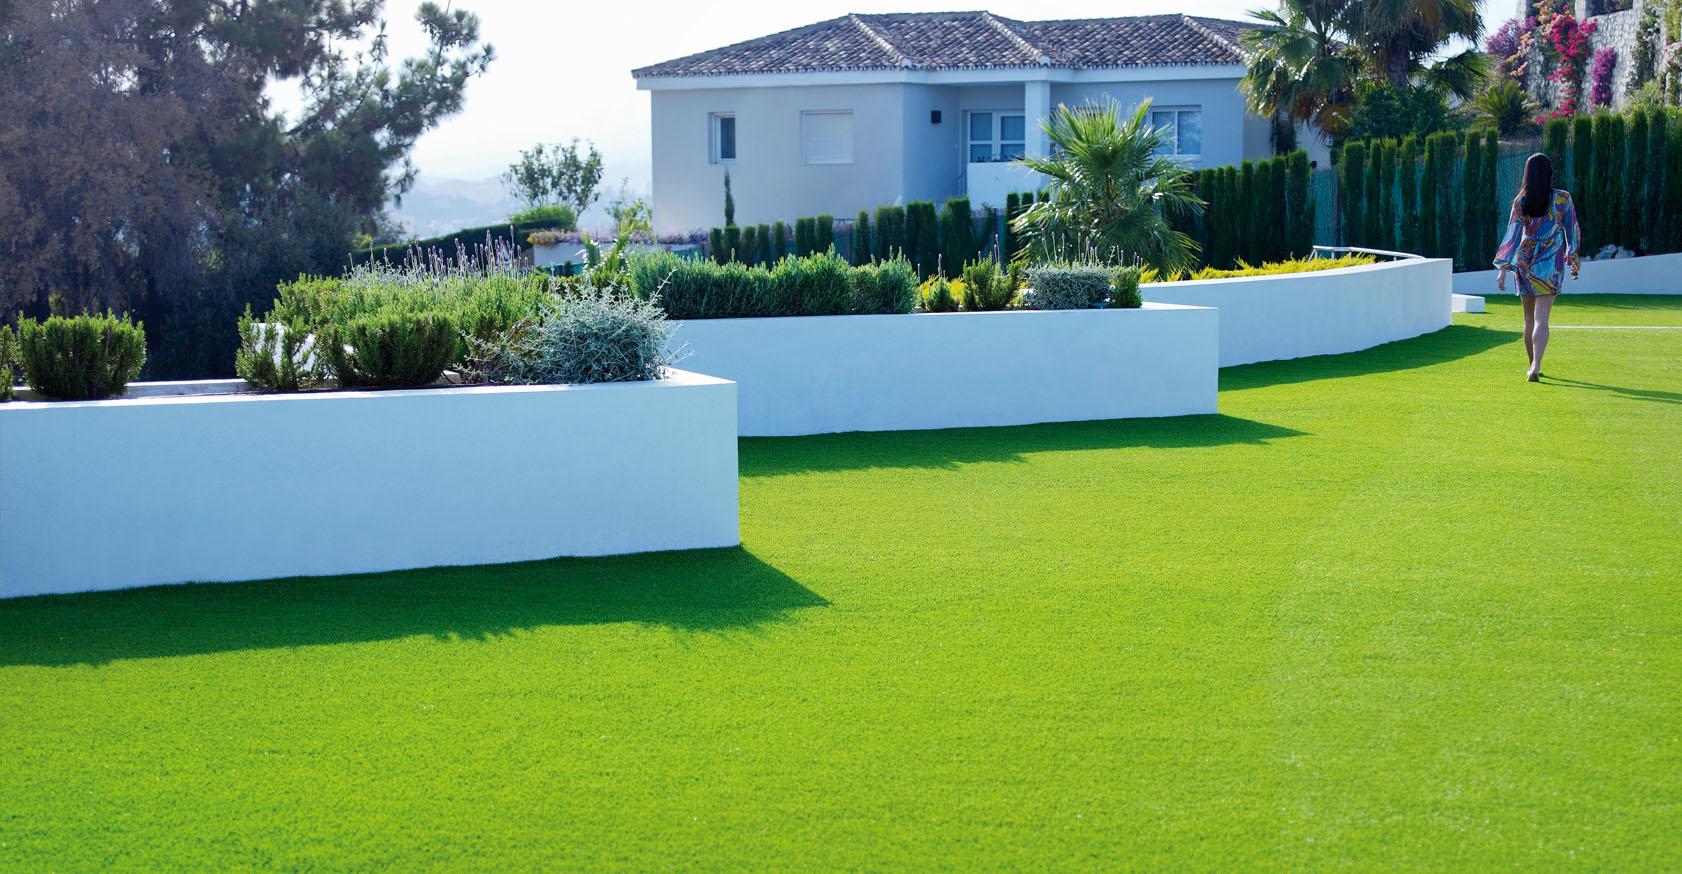 grama sintetica para jardim mercadolivre:Artificial Grass Installer